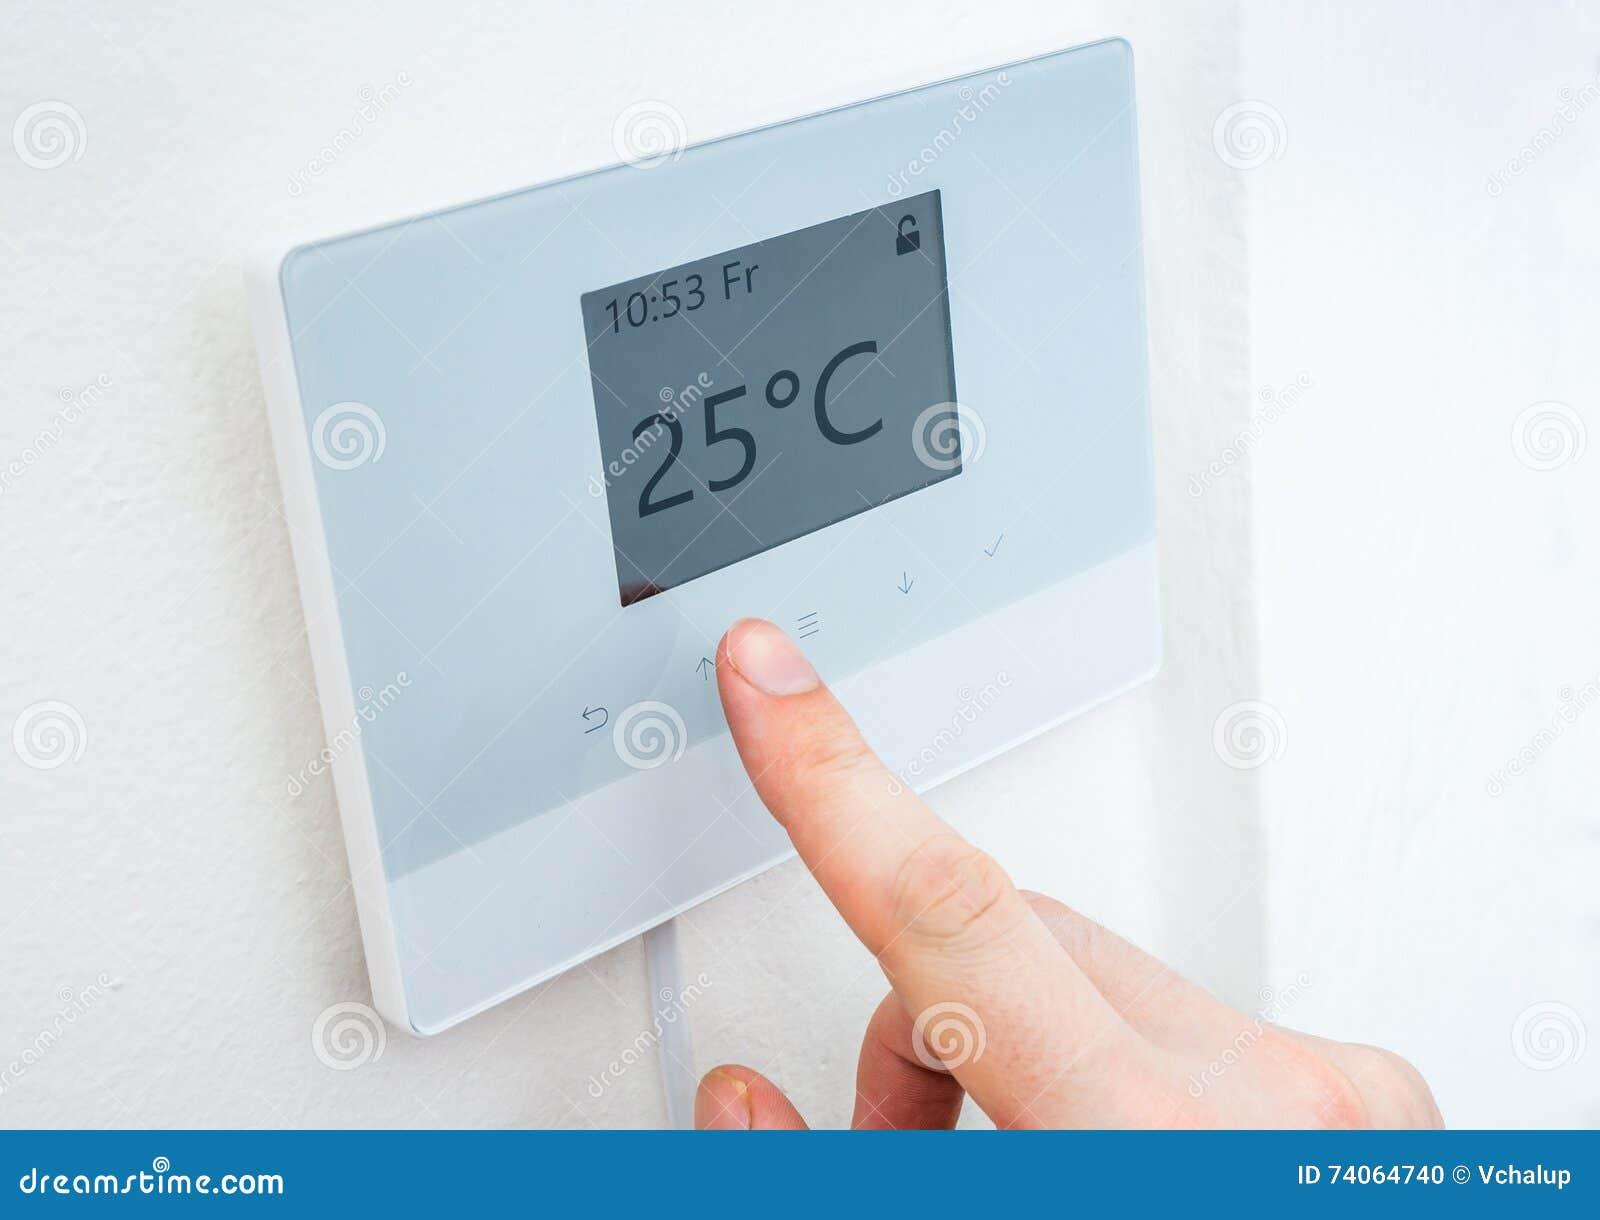 Central Heating Control Panel Stock Photo Cartoondealer